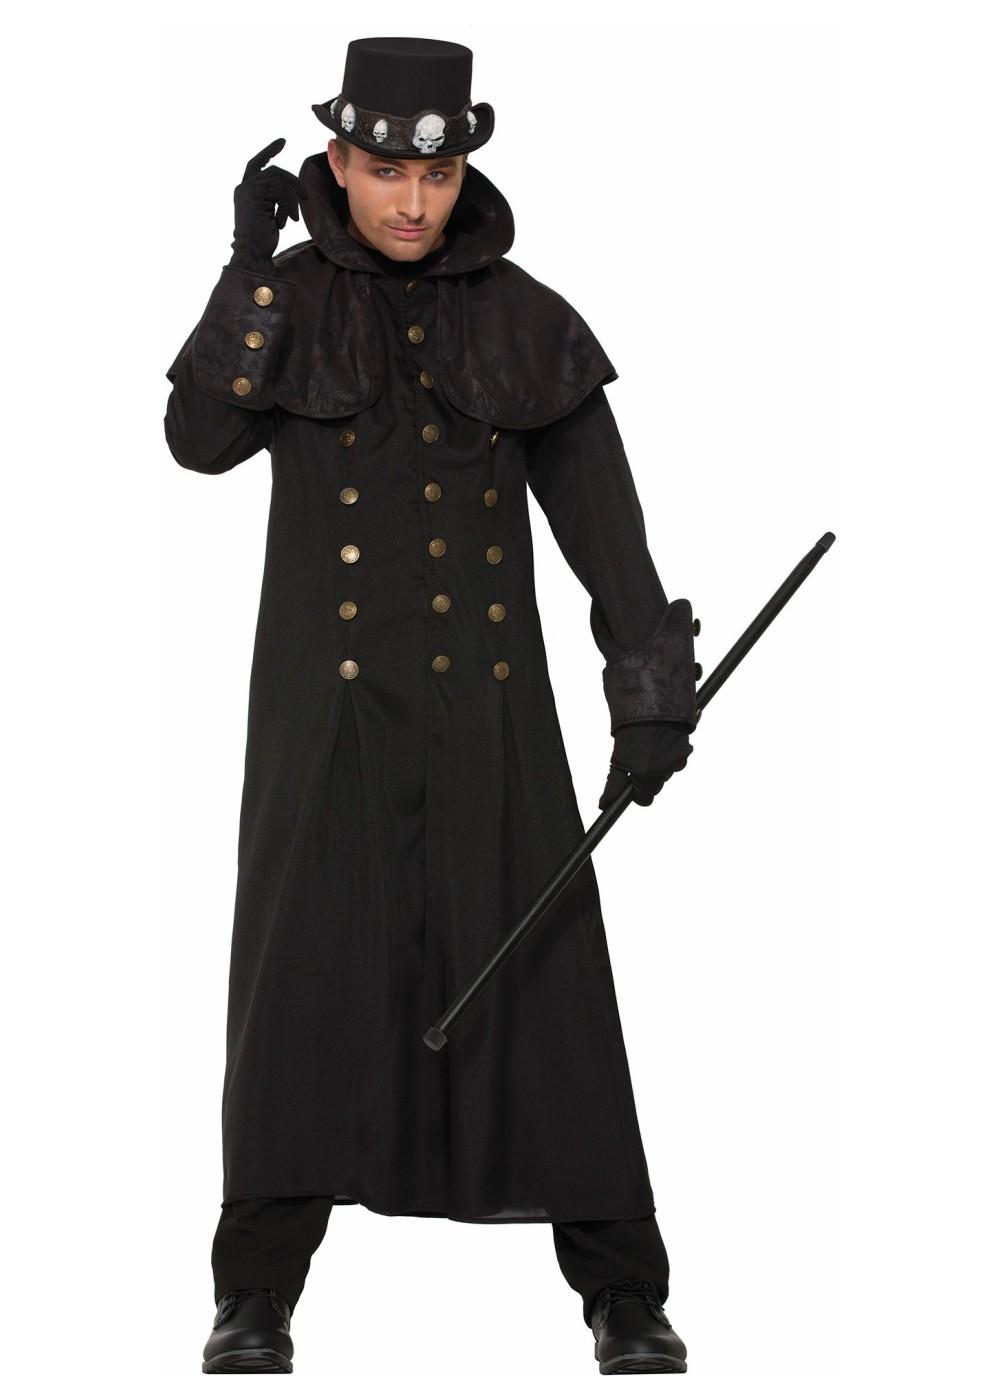 Warlock Coat Men Costume  sc 1 st  Halloween Costumes & Warlock Coat Men Costume - Scary Costumes